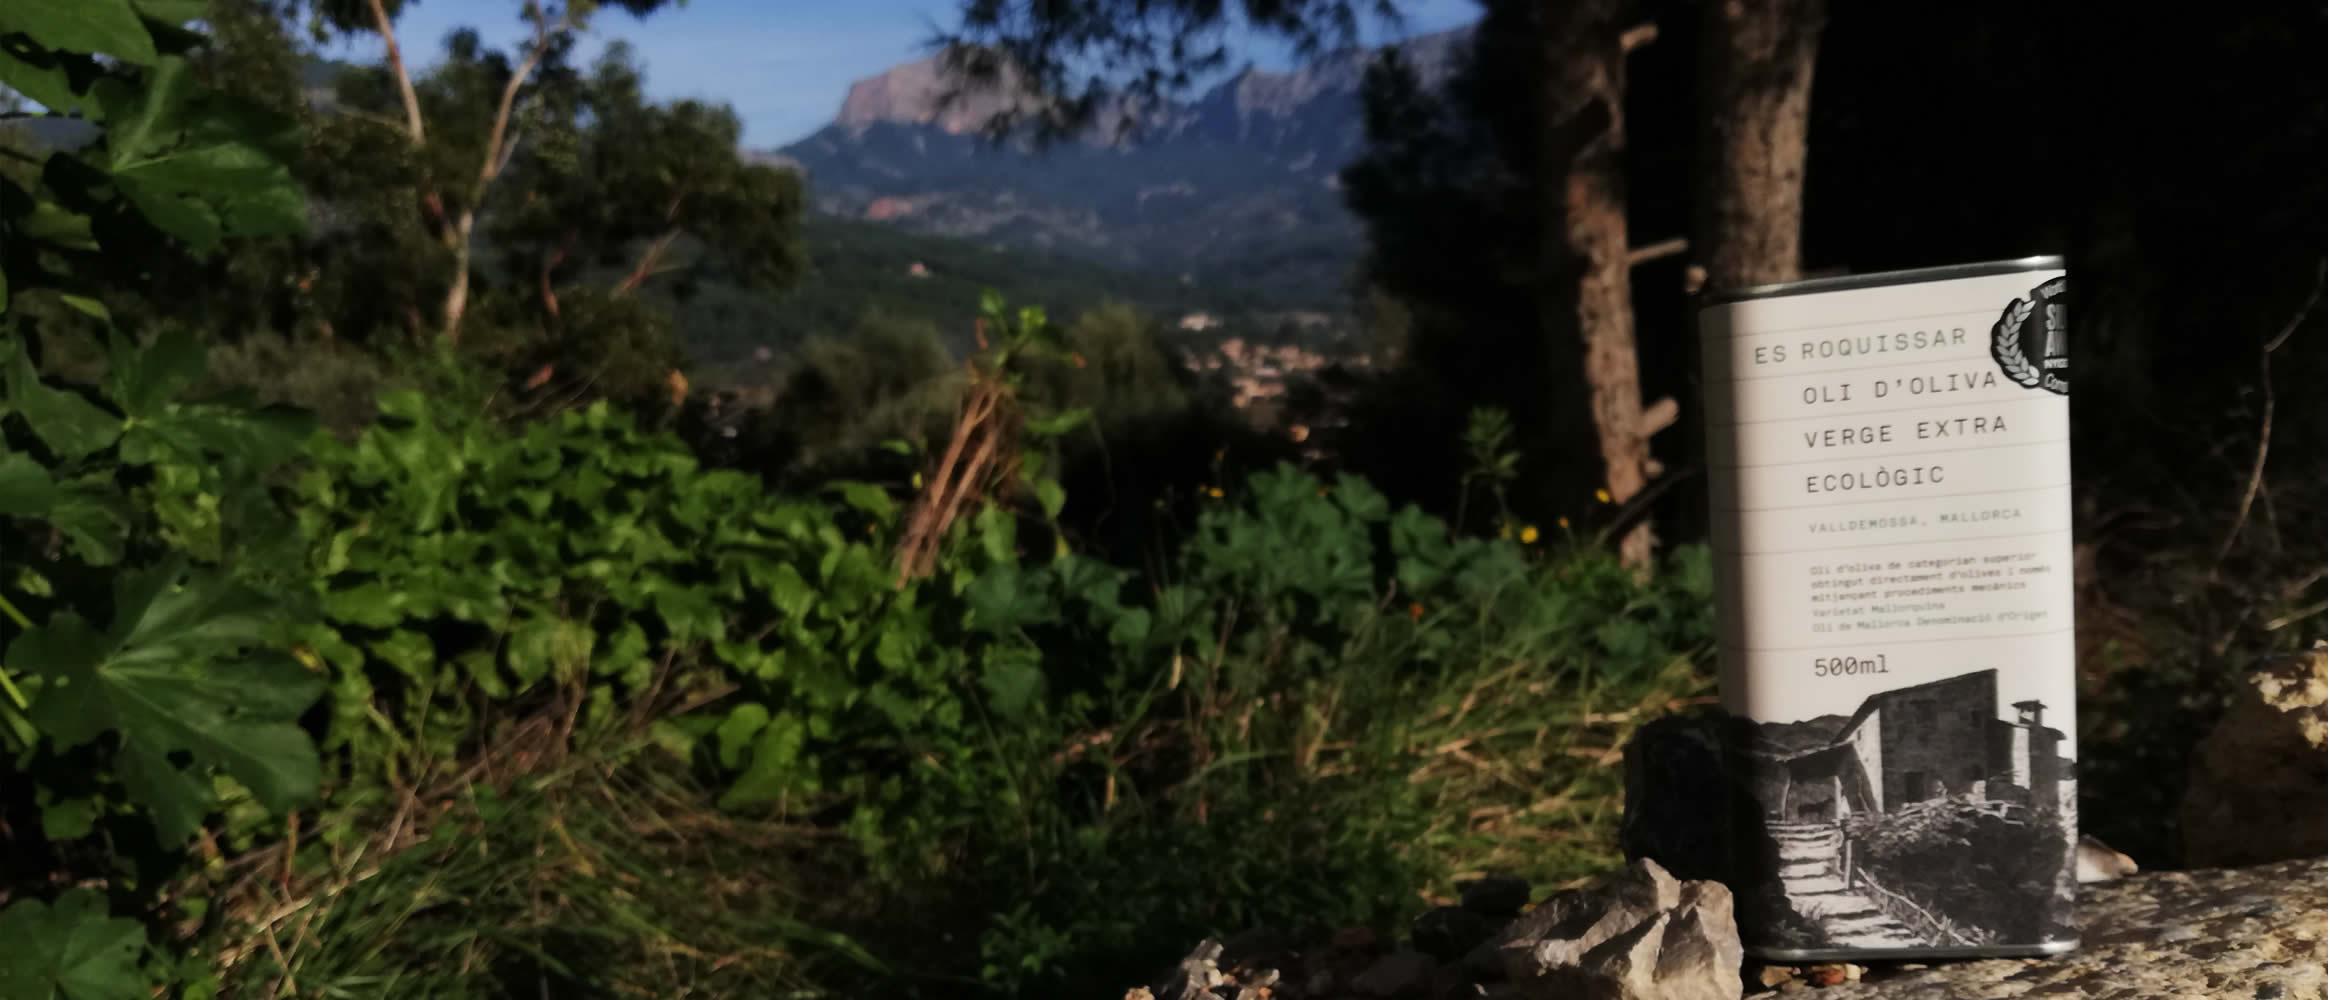 Es Roquissar Bio Olivenöl virgen extra, D.O. 500ml